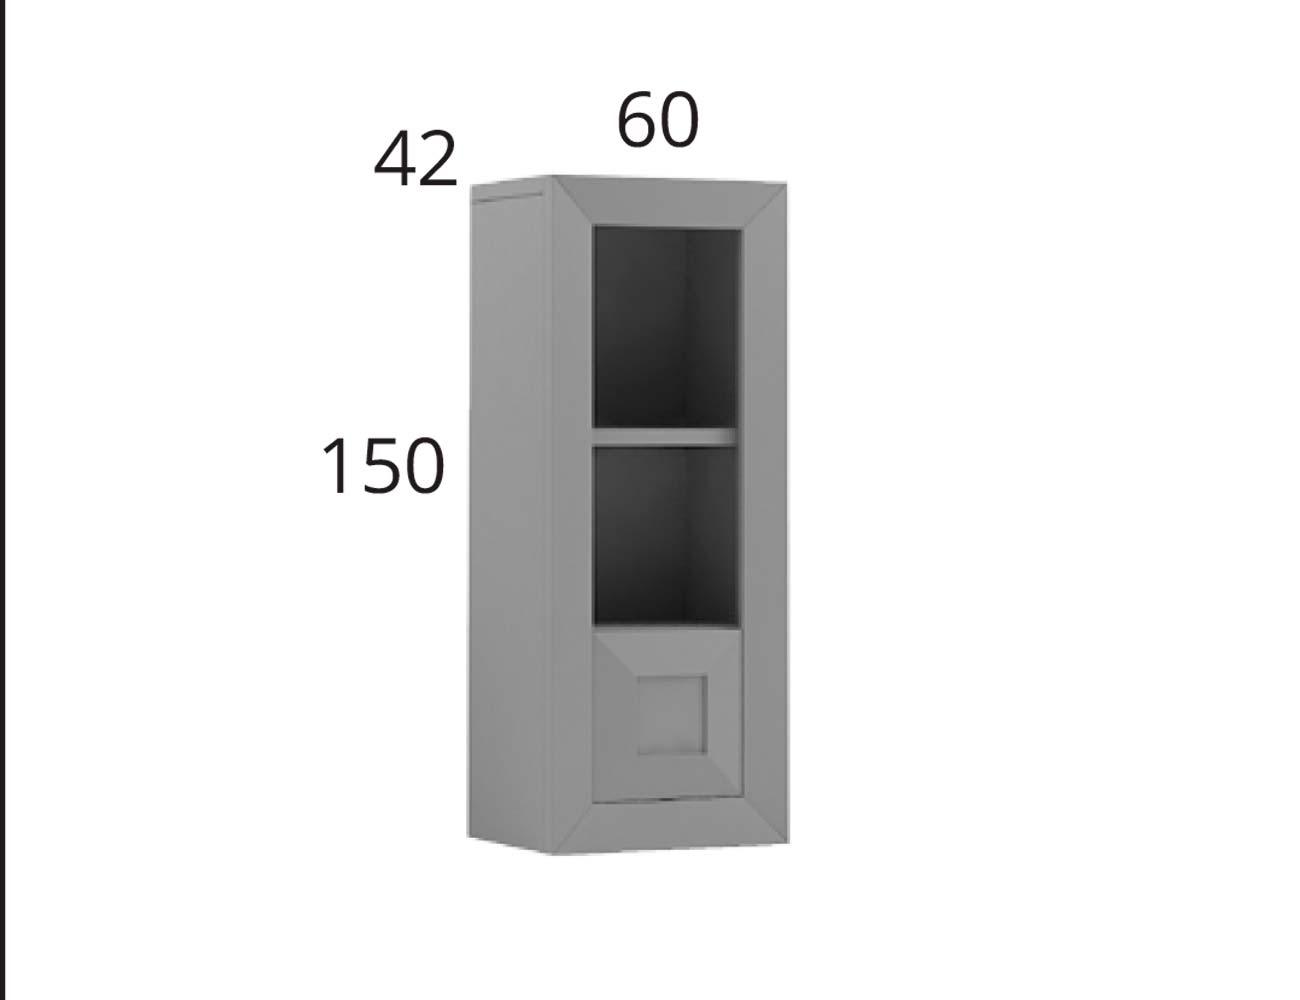 A0481